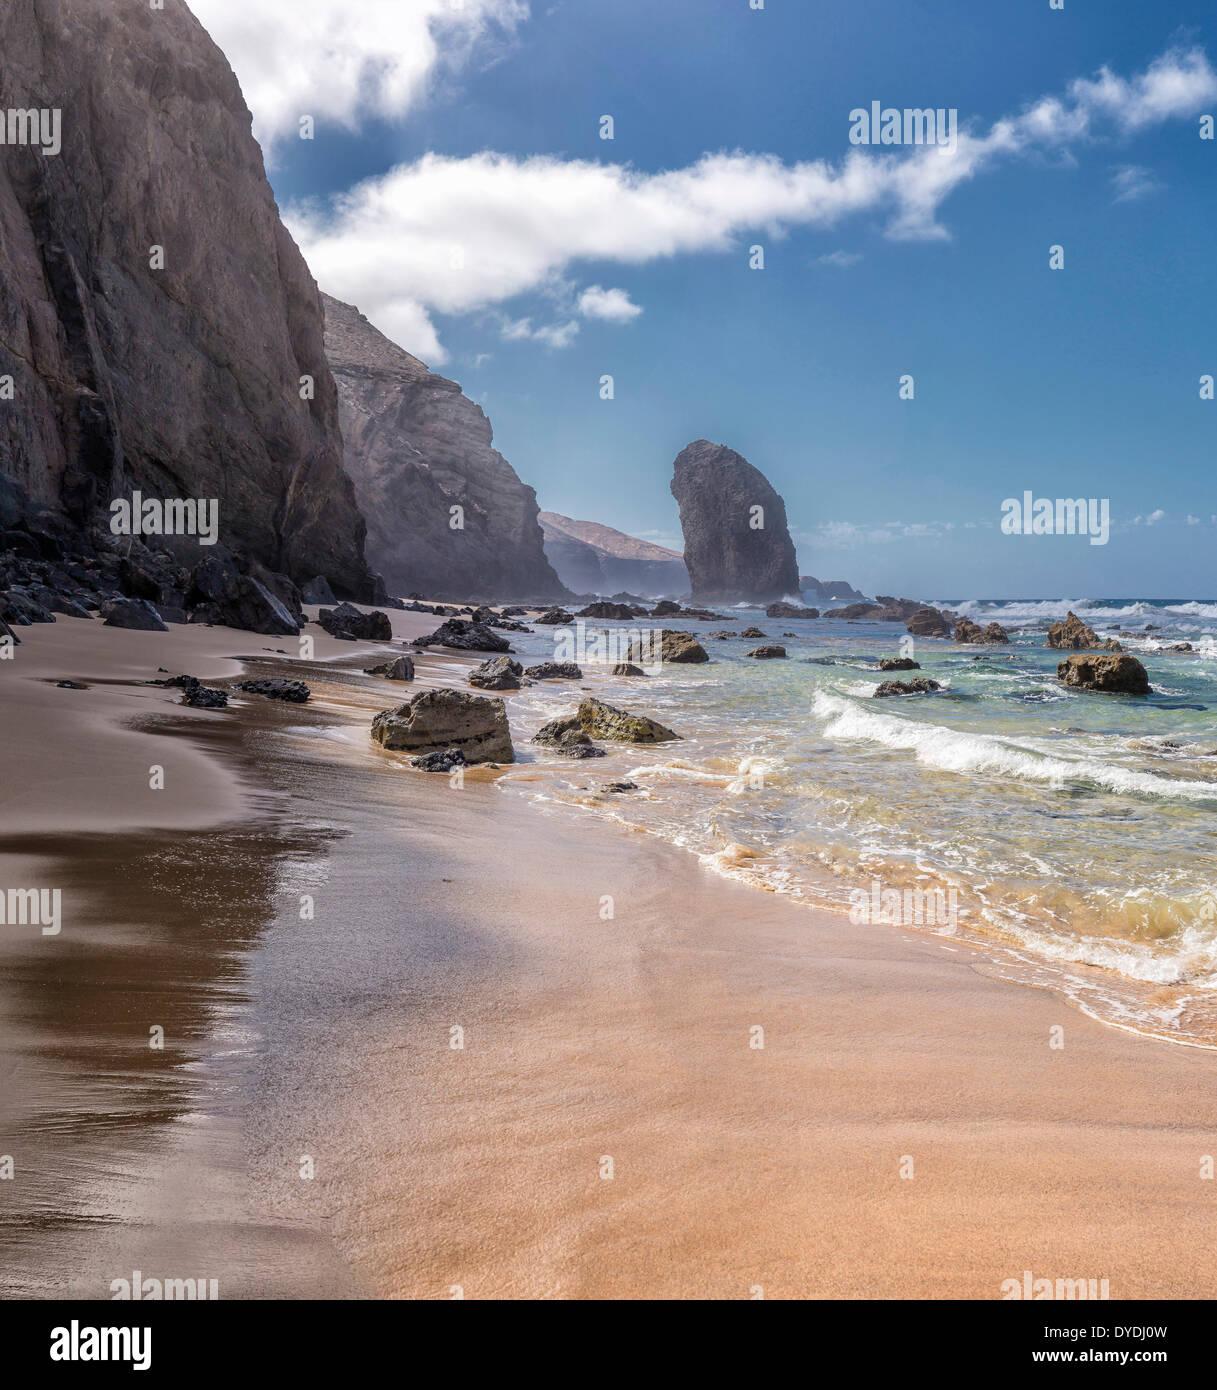 Spanien, Europa, Fuerteventura, Kanarische Inseln, Morro Jable, Playa Roque del Moro, Landschaft, Sommer, Meer, Stockbild